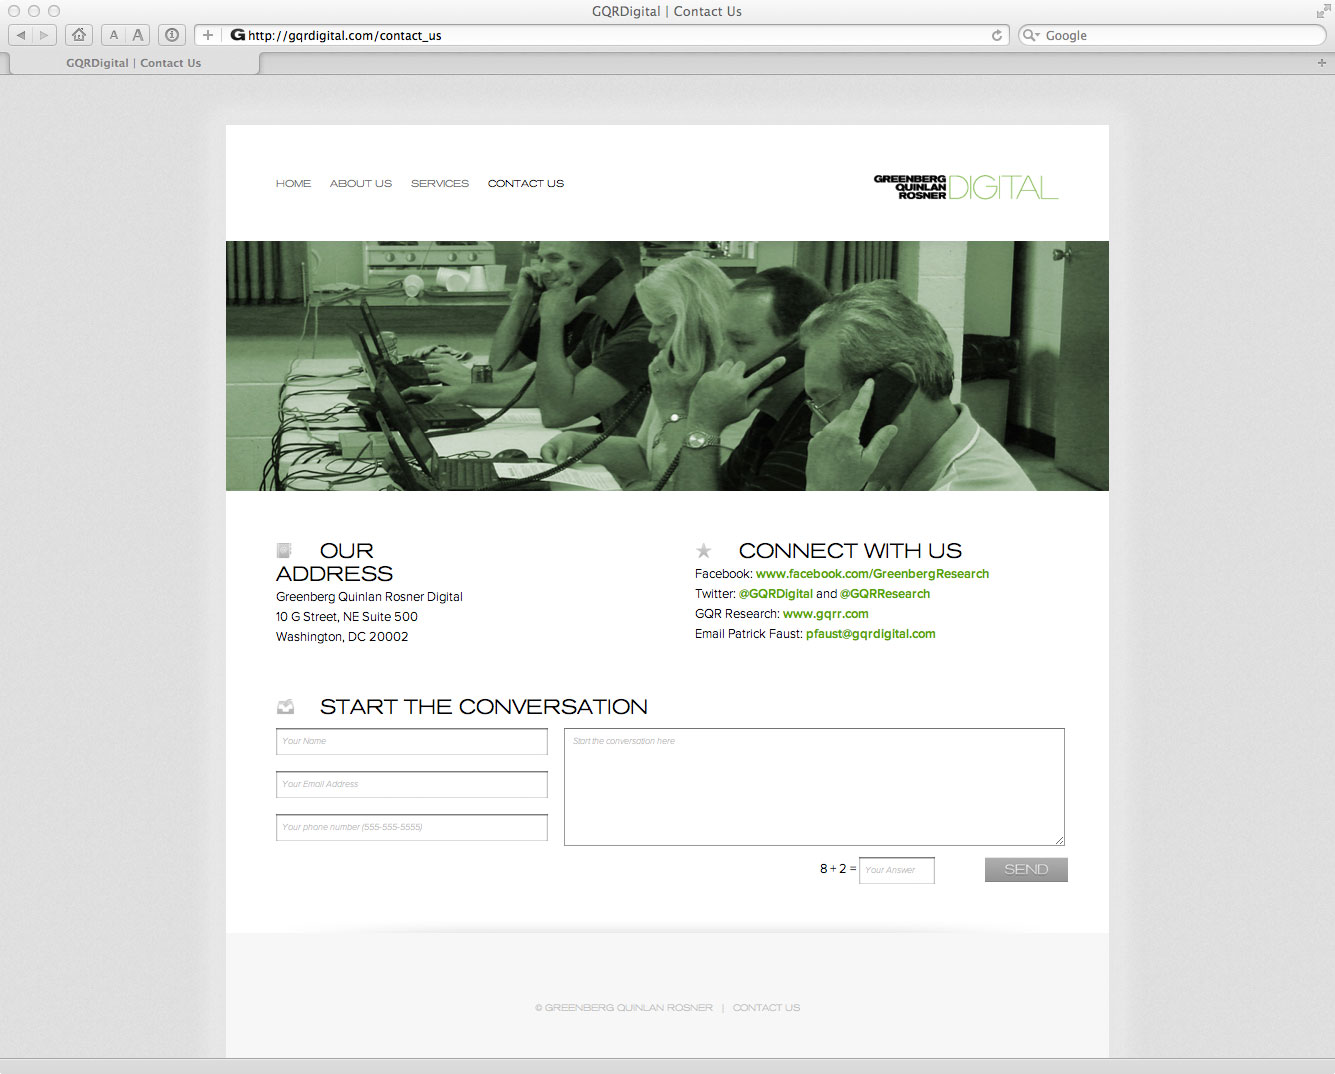 GQRD_ScreenShots_4.jpg